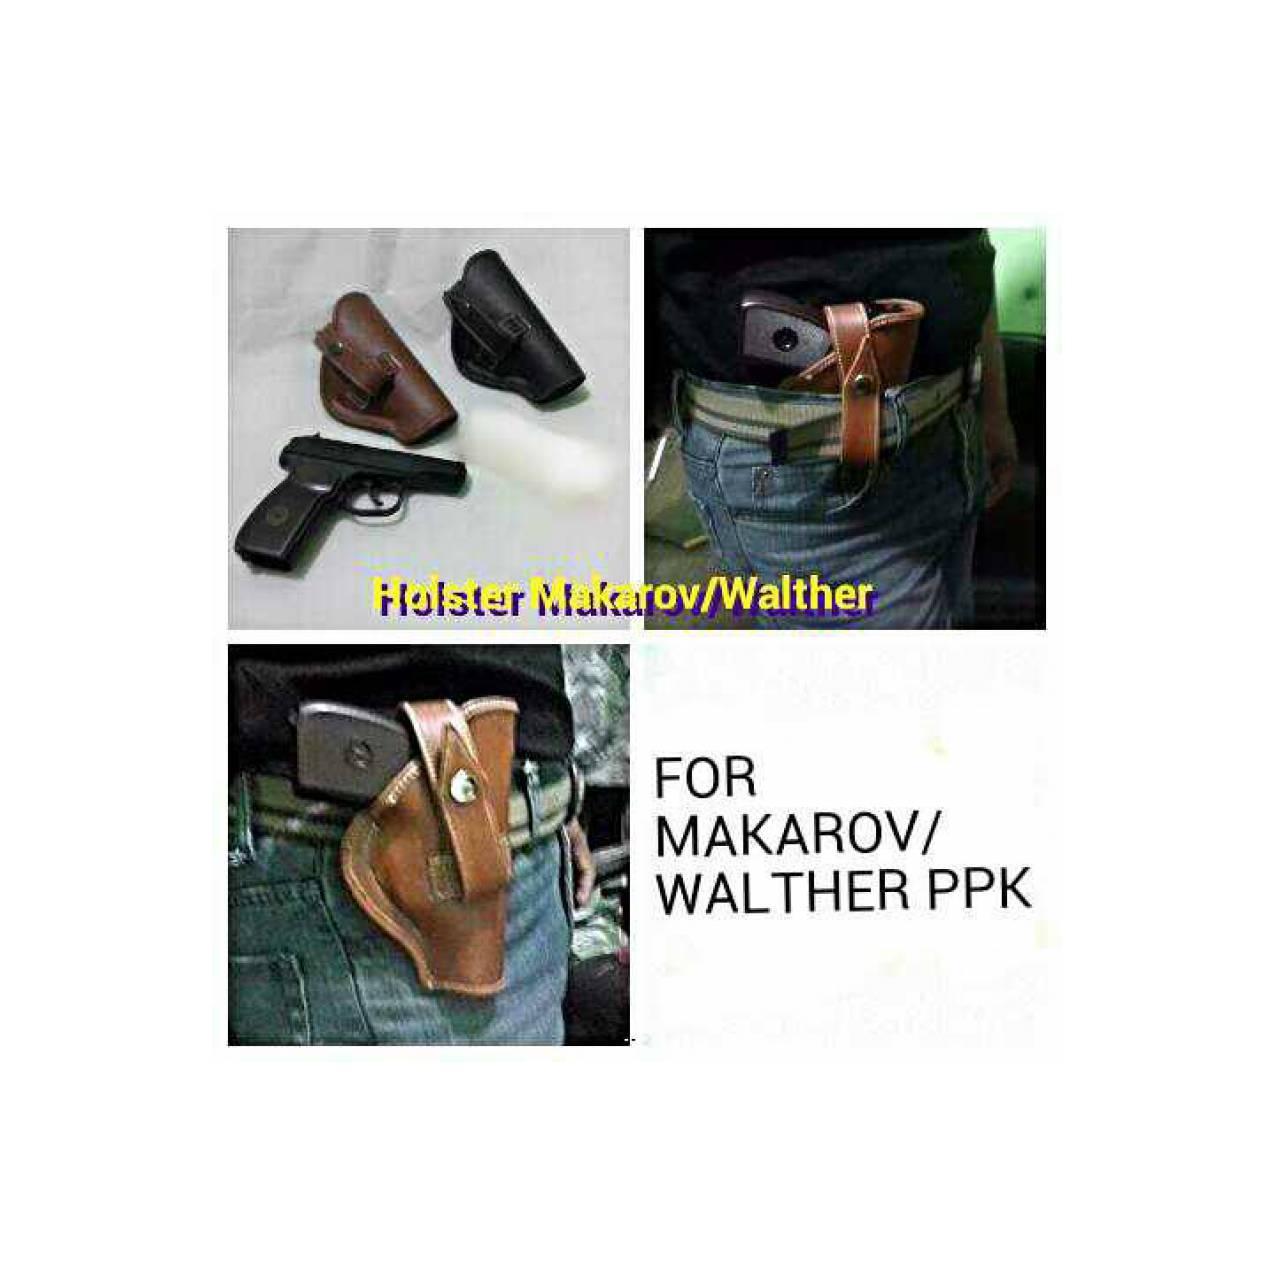 HOLSTER IWB BAIKAL/MAKAROV/WALTHER PPKS